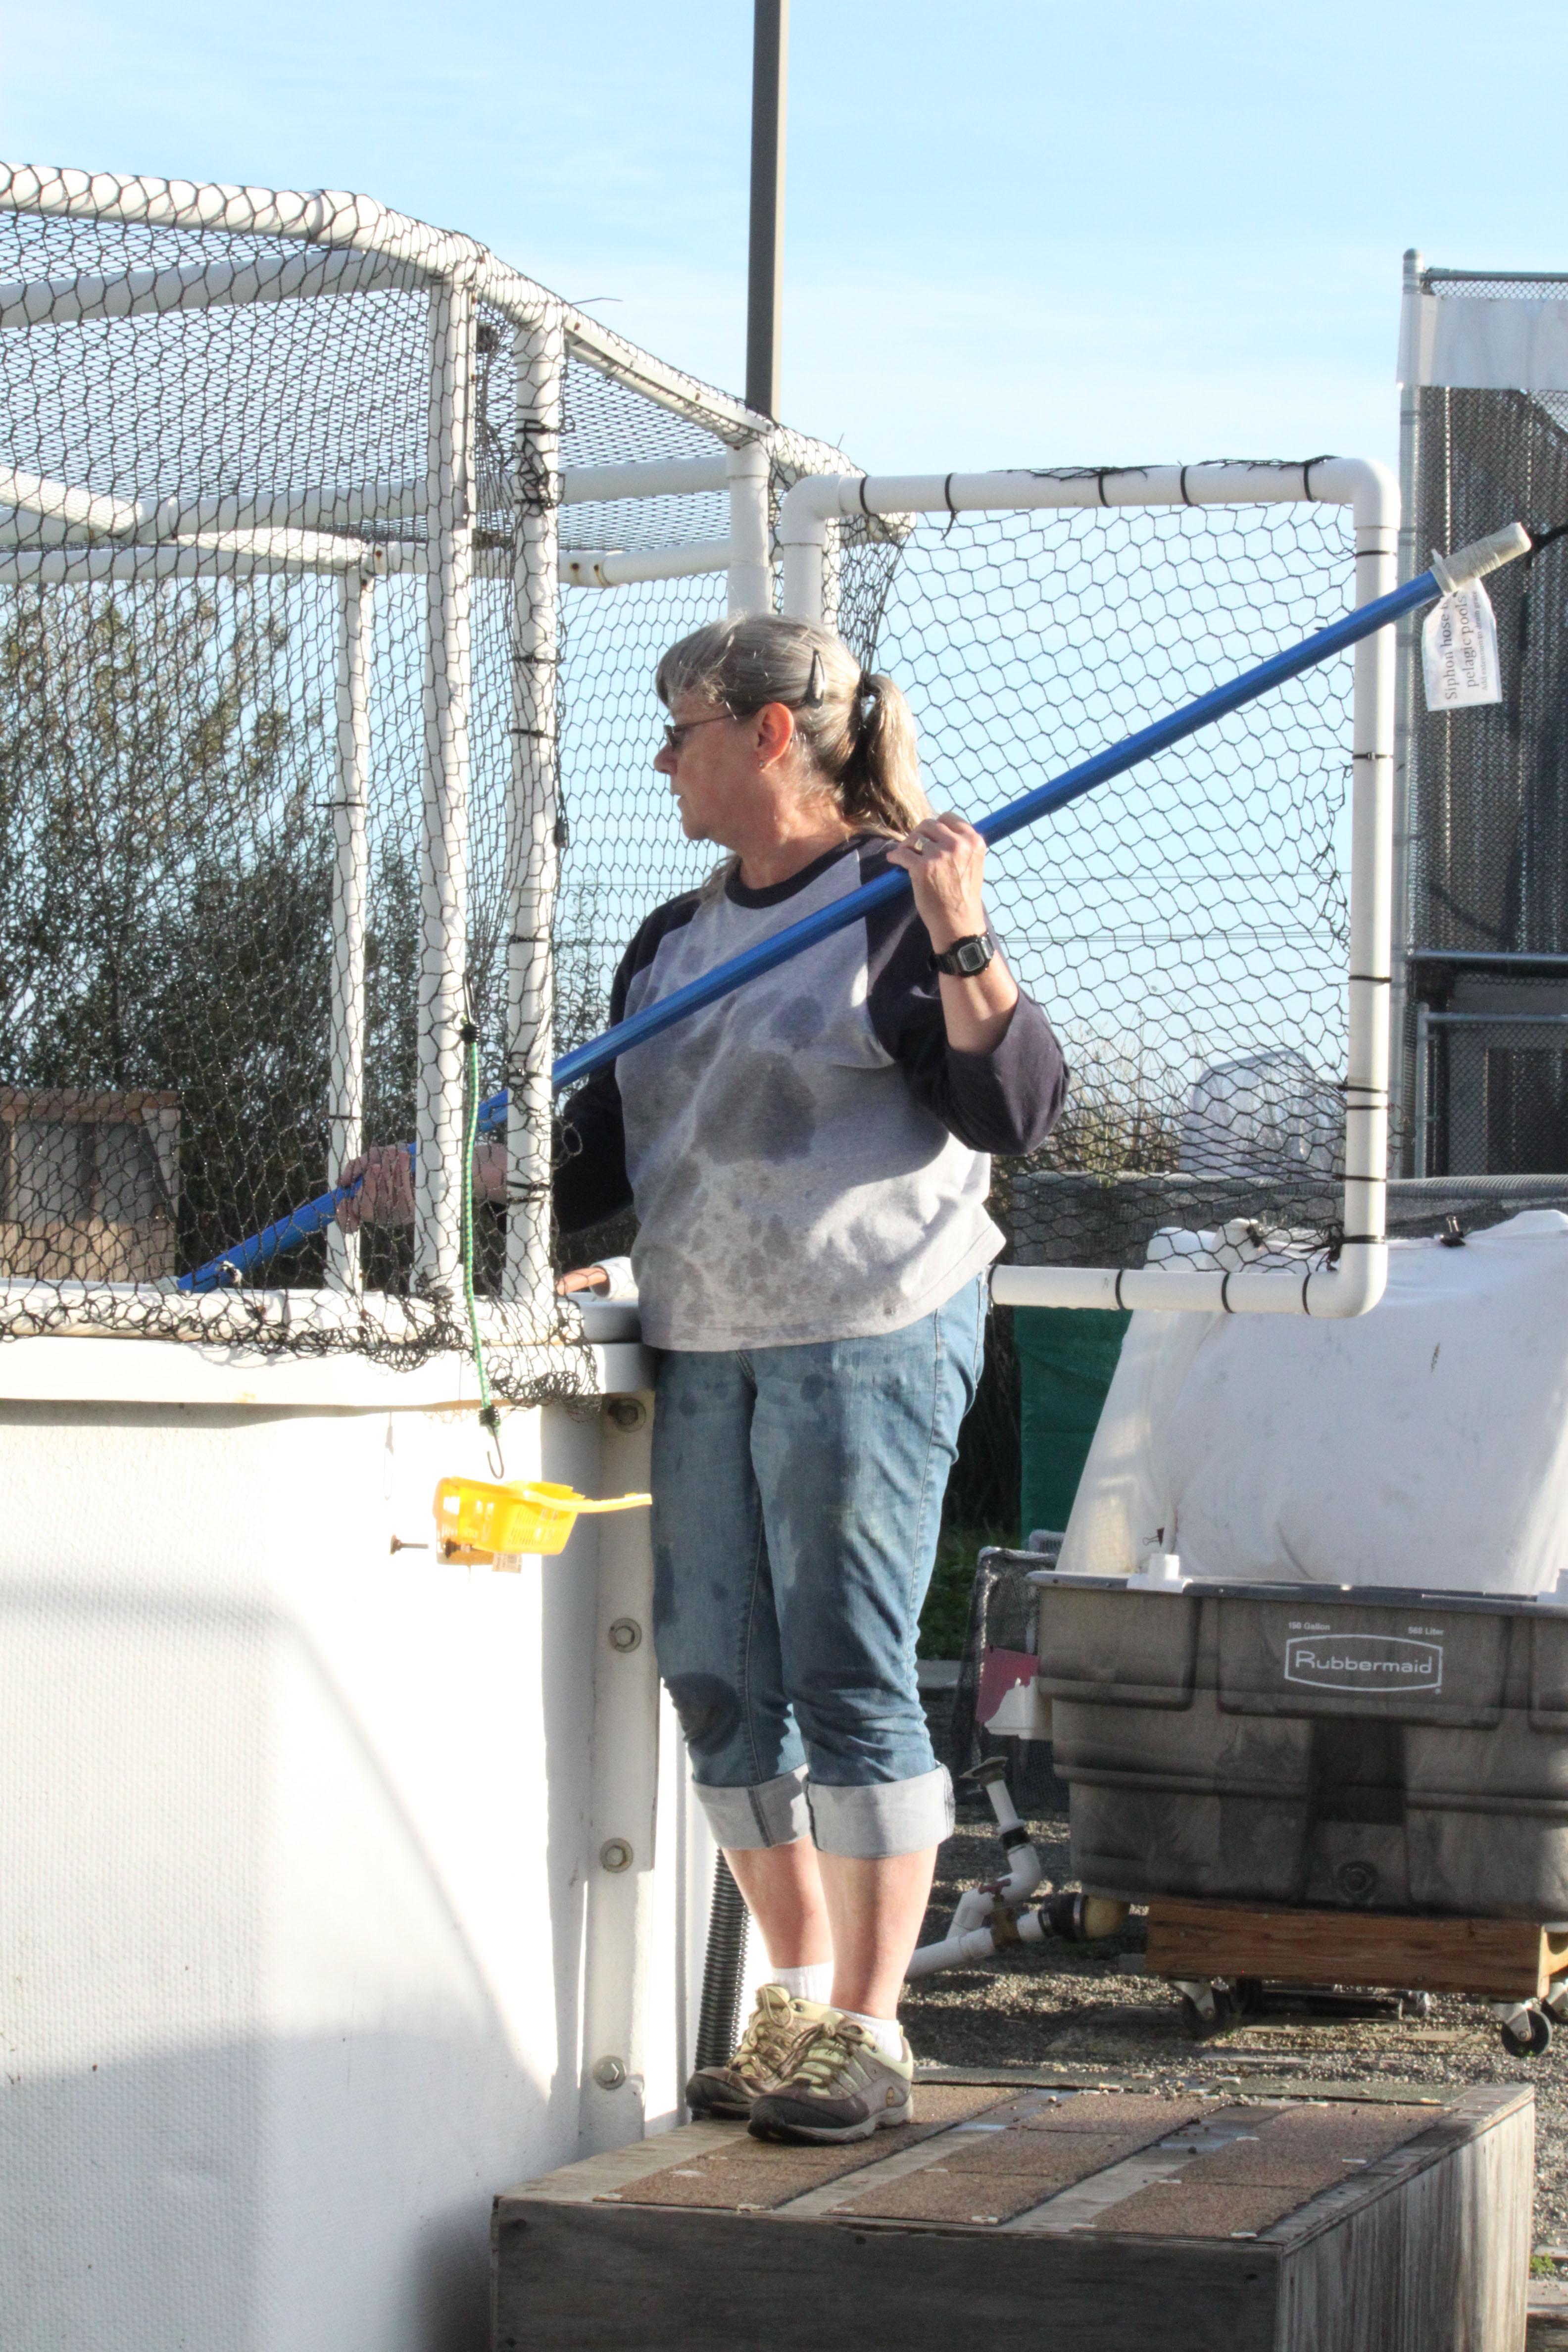 SF Bay Center volunteer Lela Nishizaki siphoning a pool